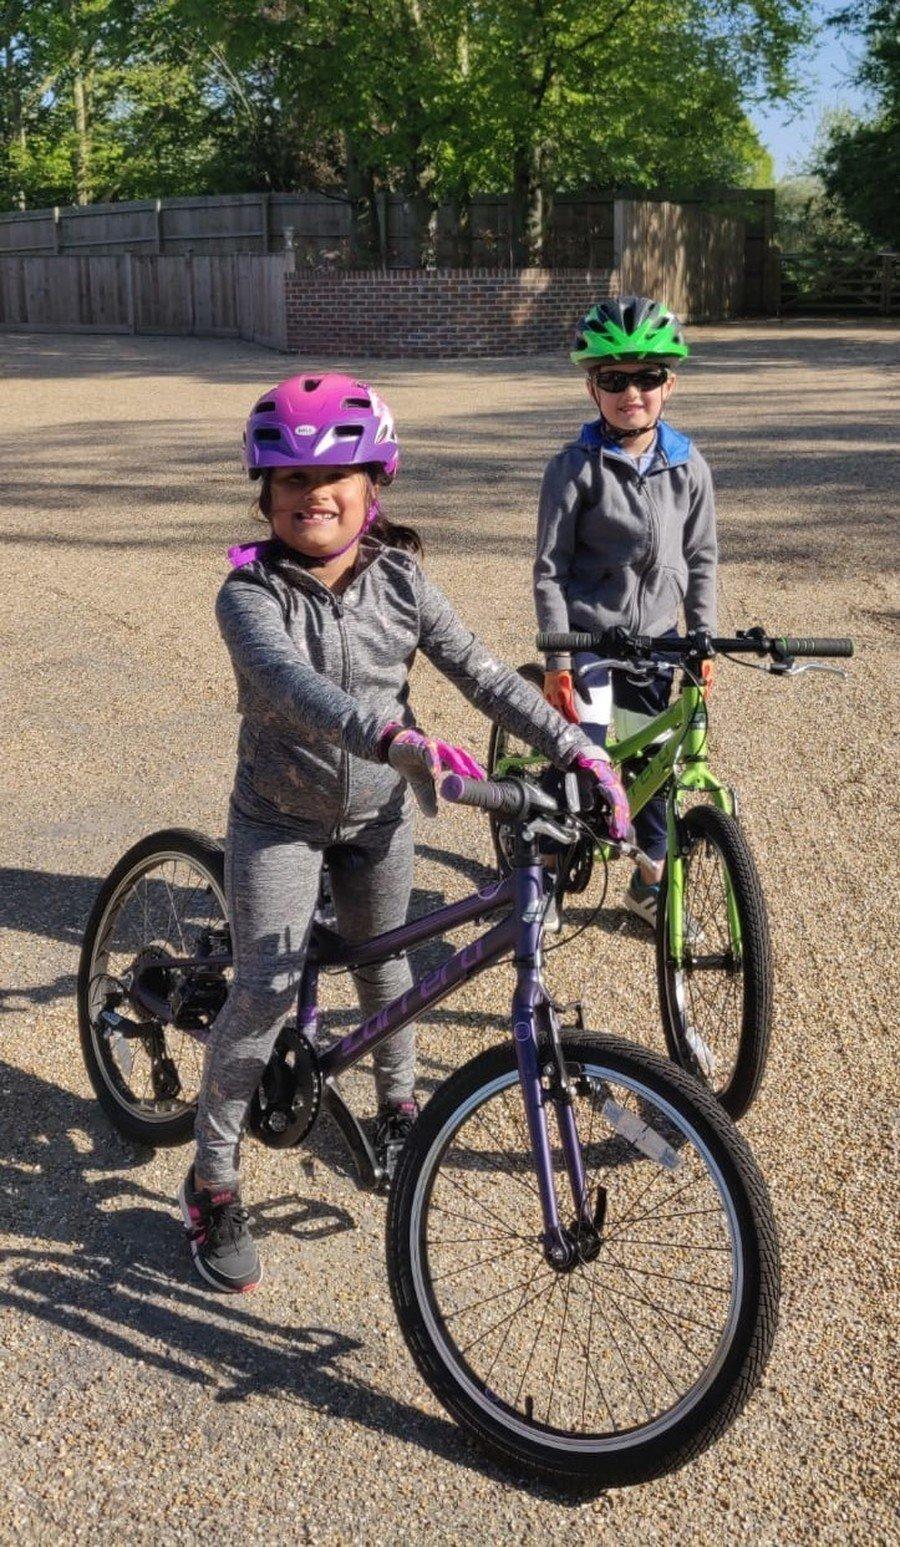 Indya and Leon taking a bike ride in the sun - Year 2